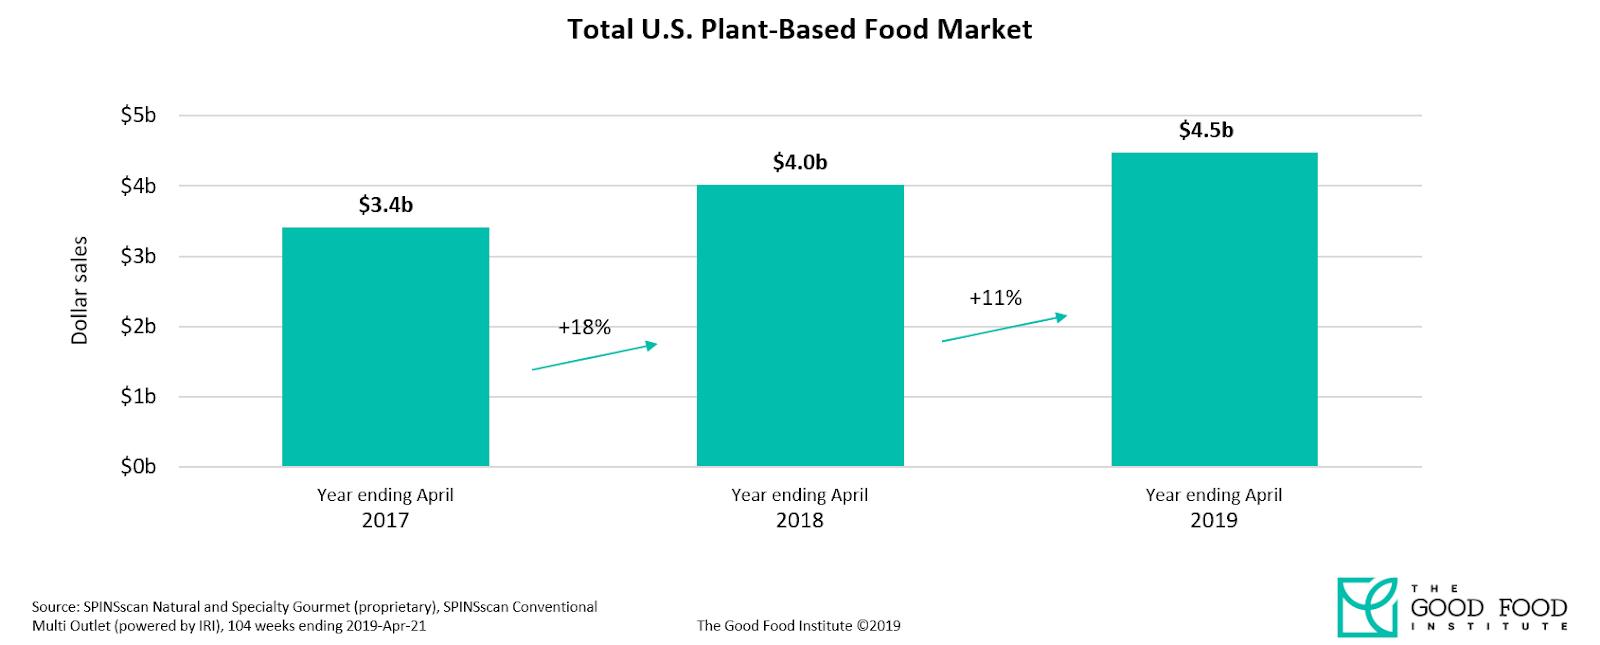 GFI Chart - Total U.S. Plant-Based Food Market